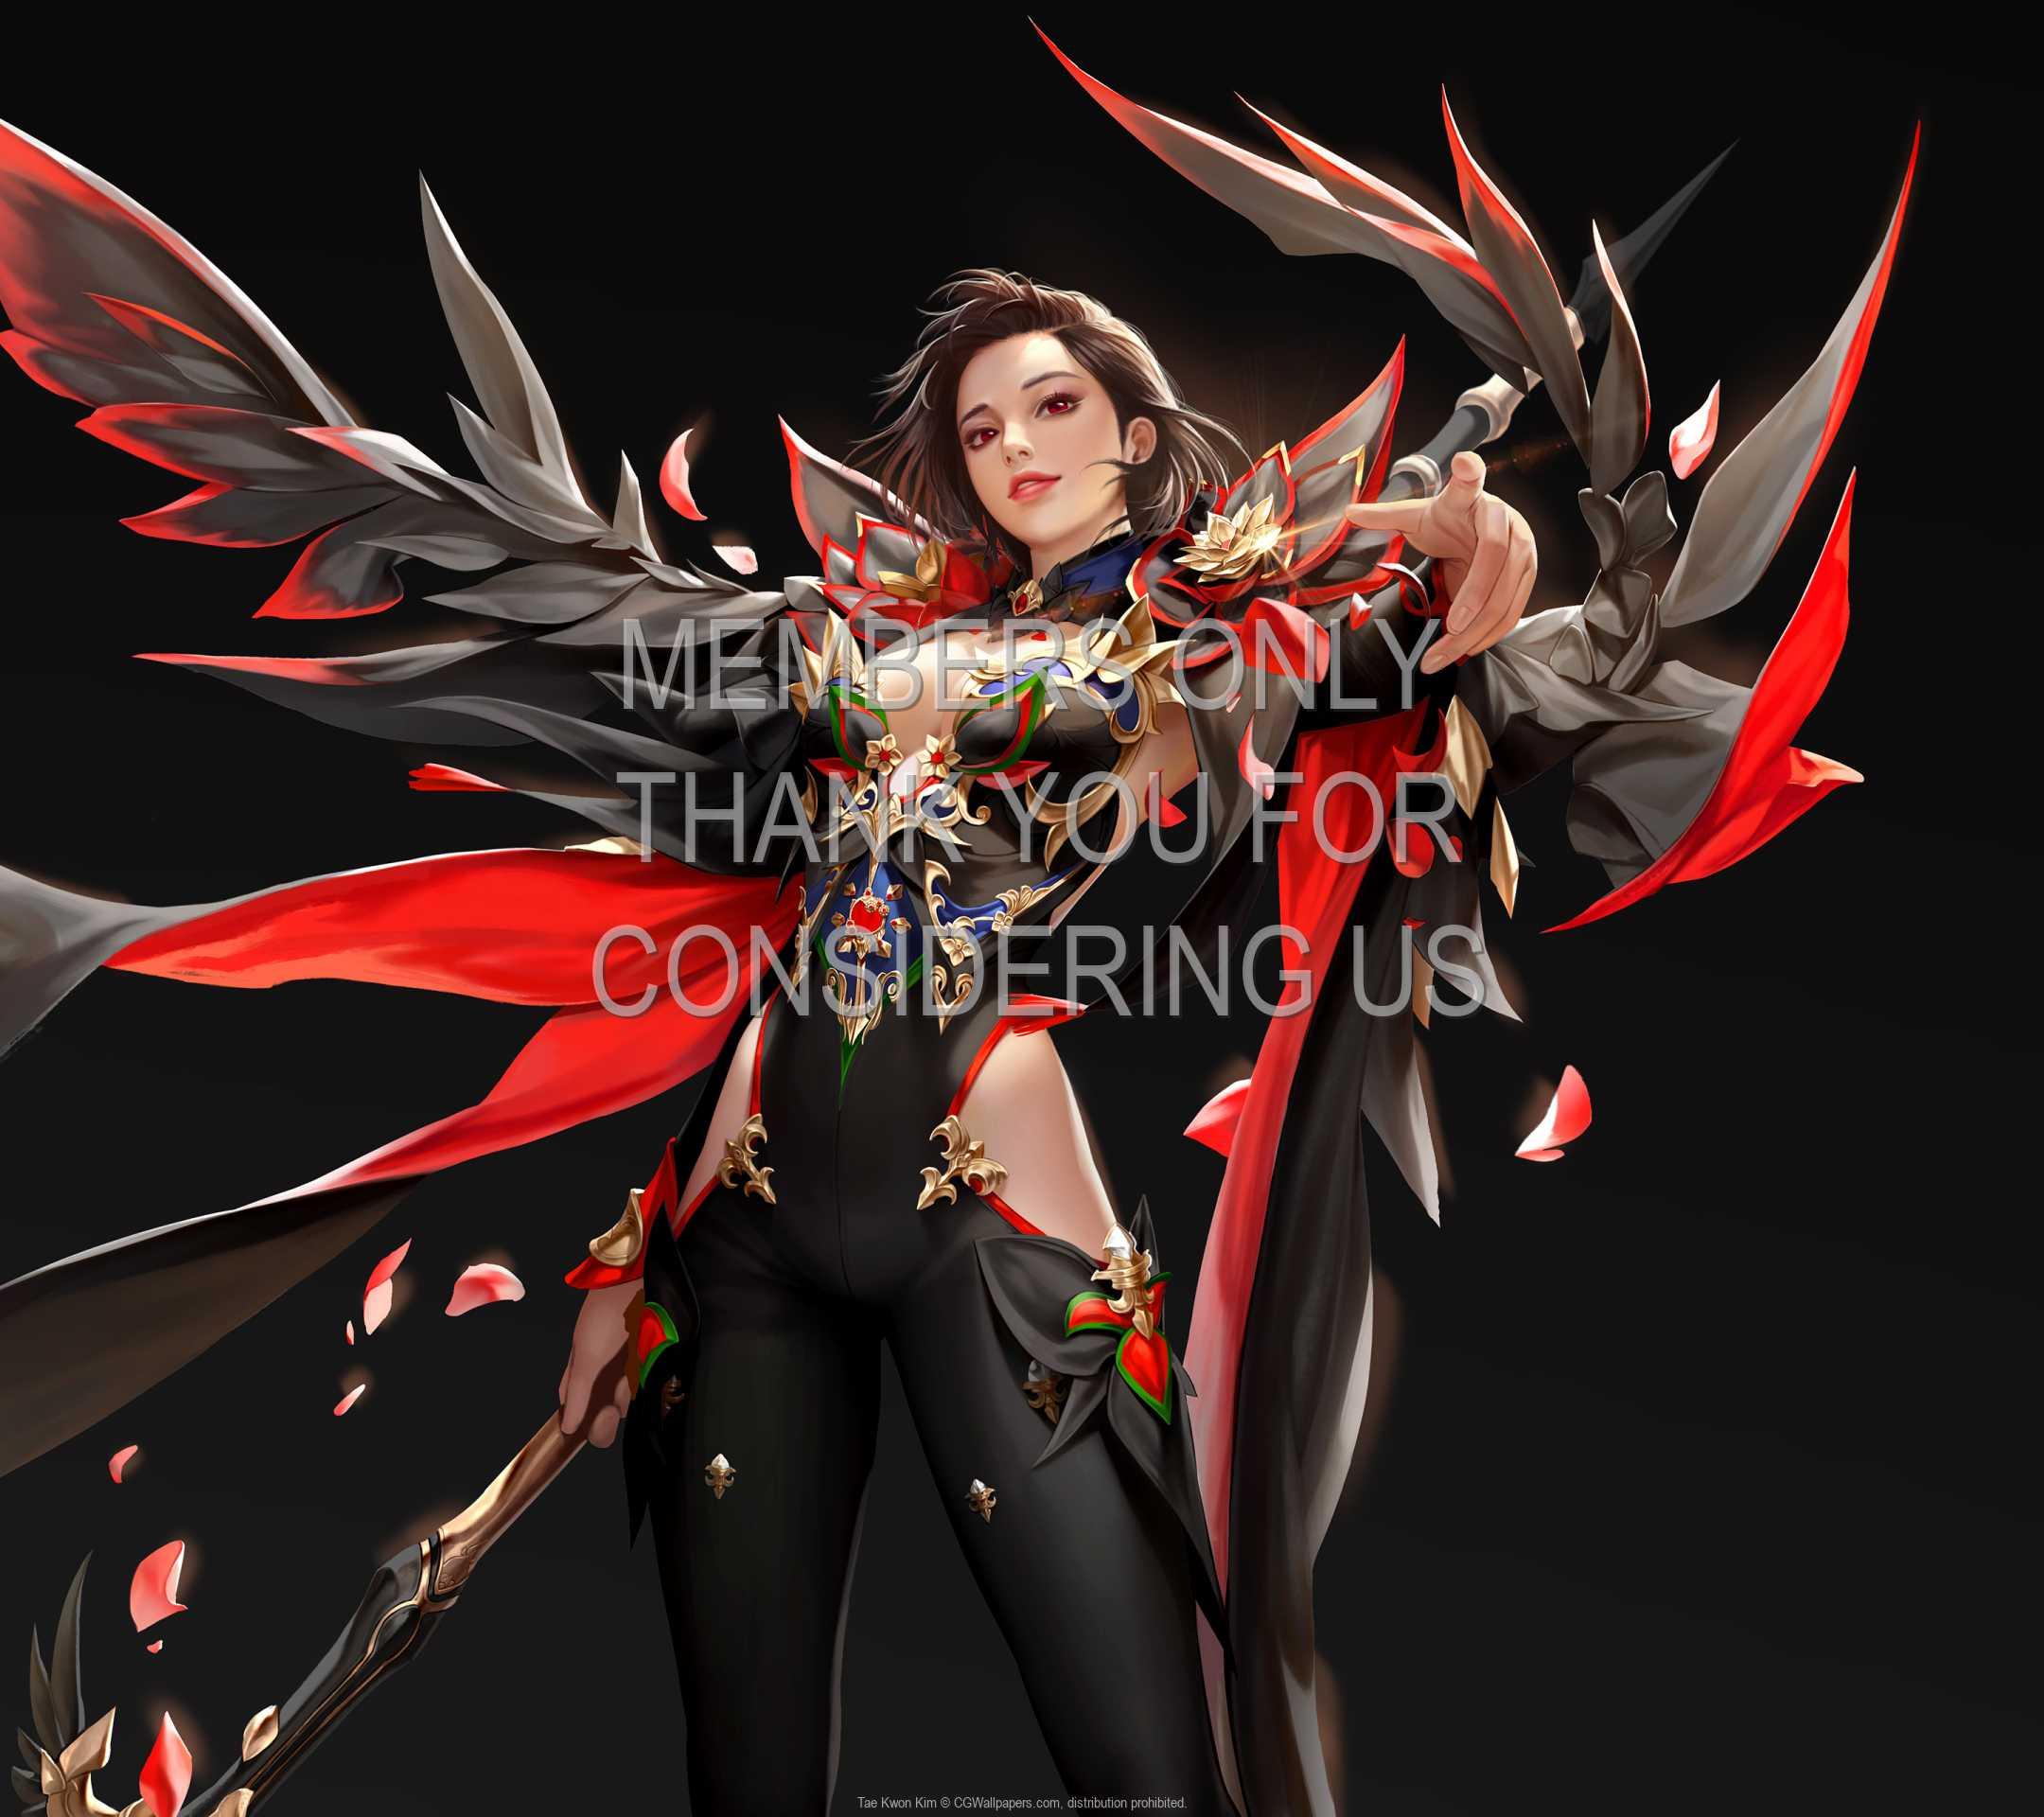 Tae Kwon Kim 1080p Horizontal Mobile wallpaper or background 05